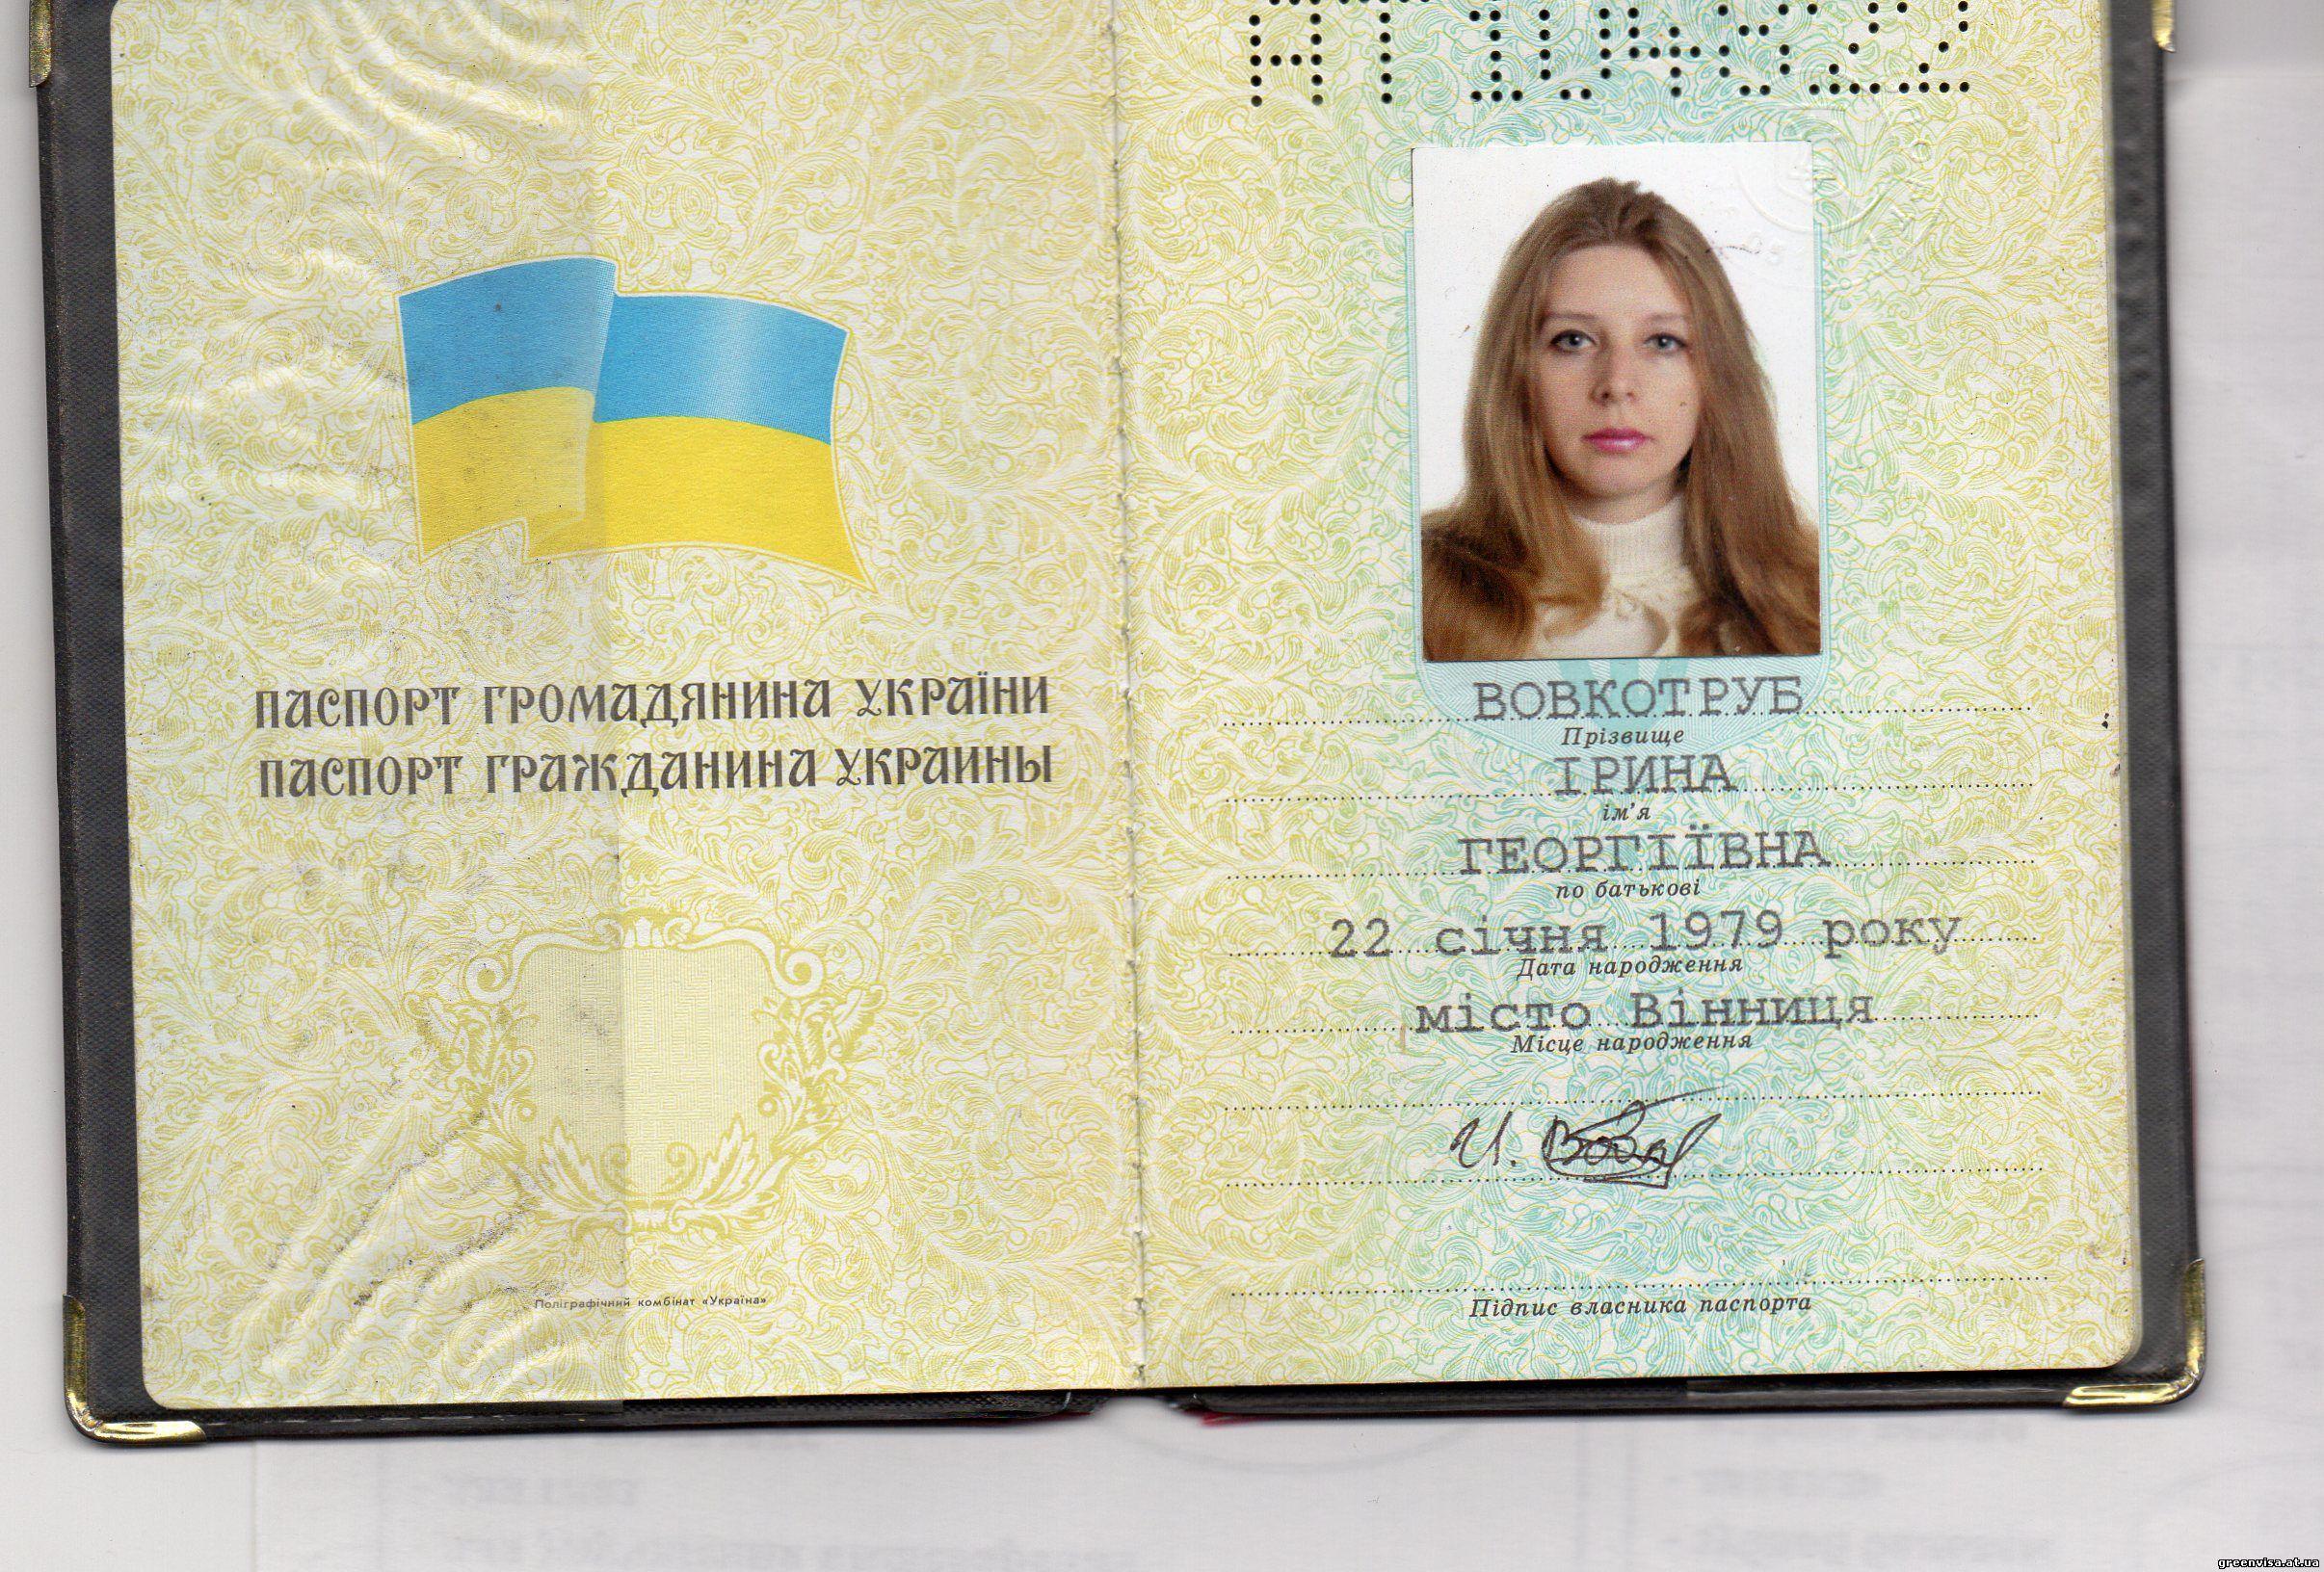 Meet single russian women and beautiful ukrainian girls looking for love